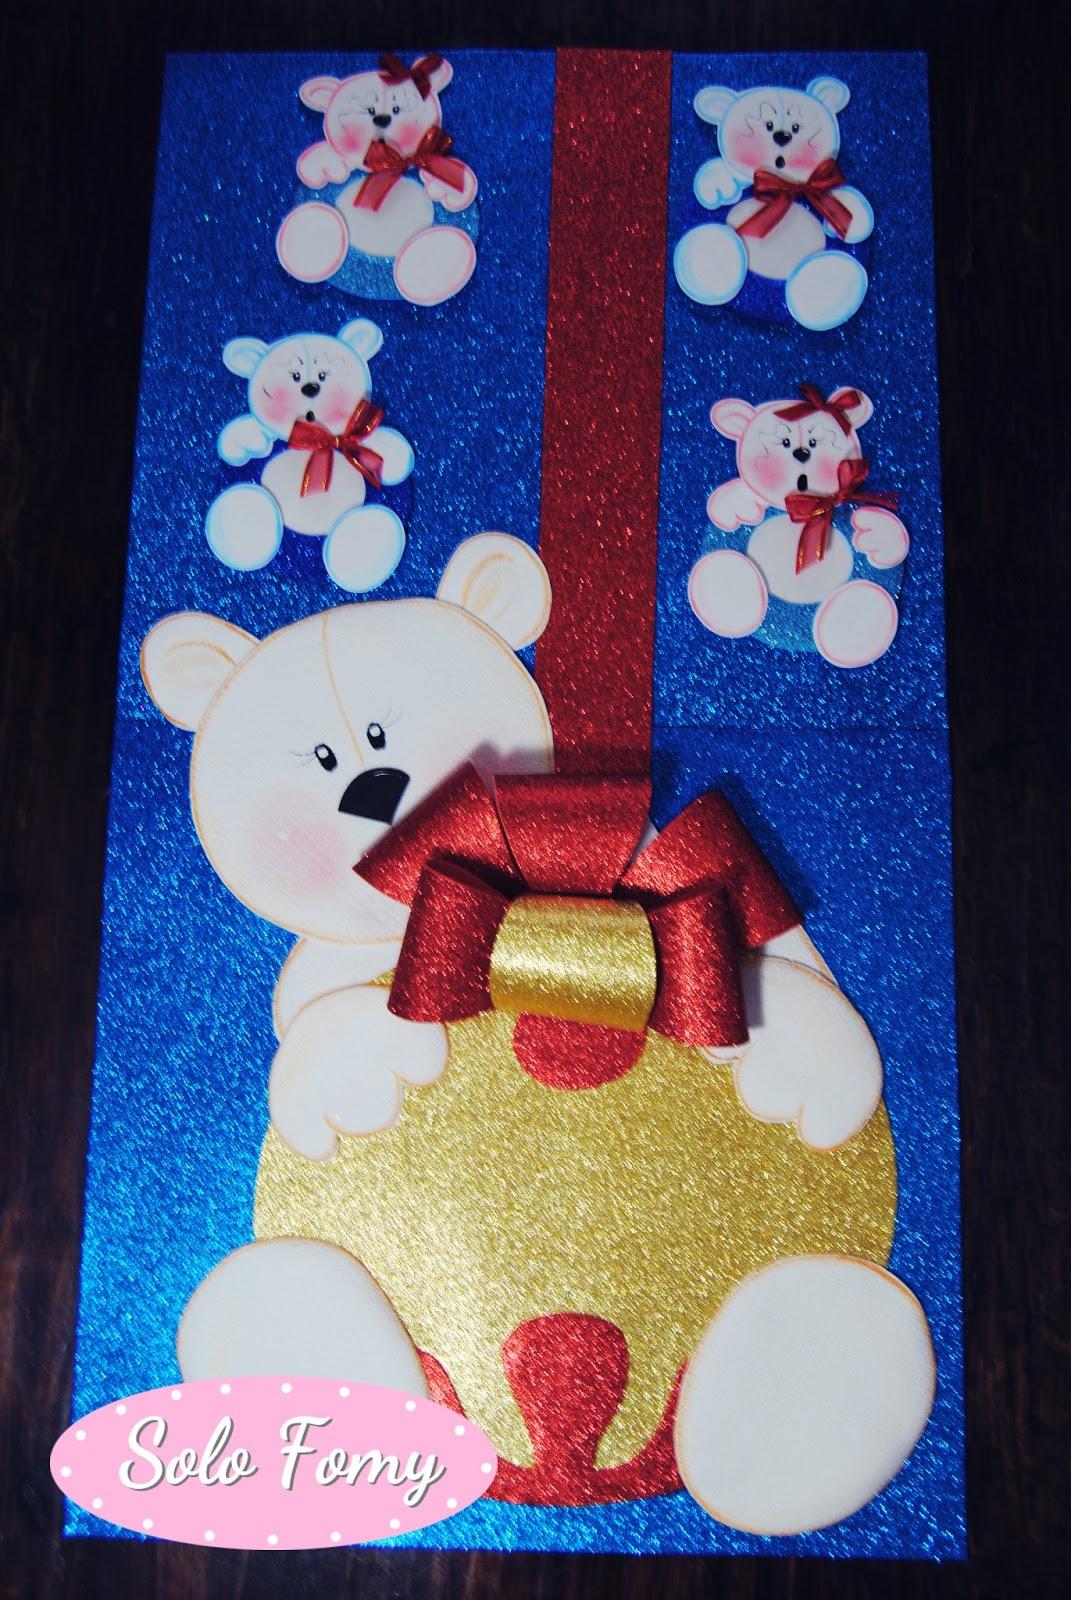 Solo fomy decoracion navide a para puertas for Puertas decoradas de navidad para preescolar